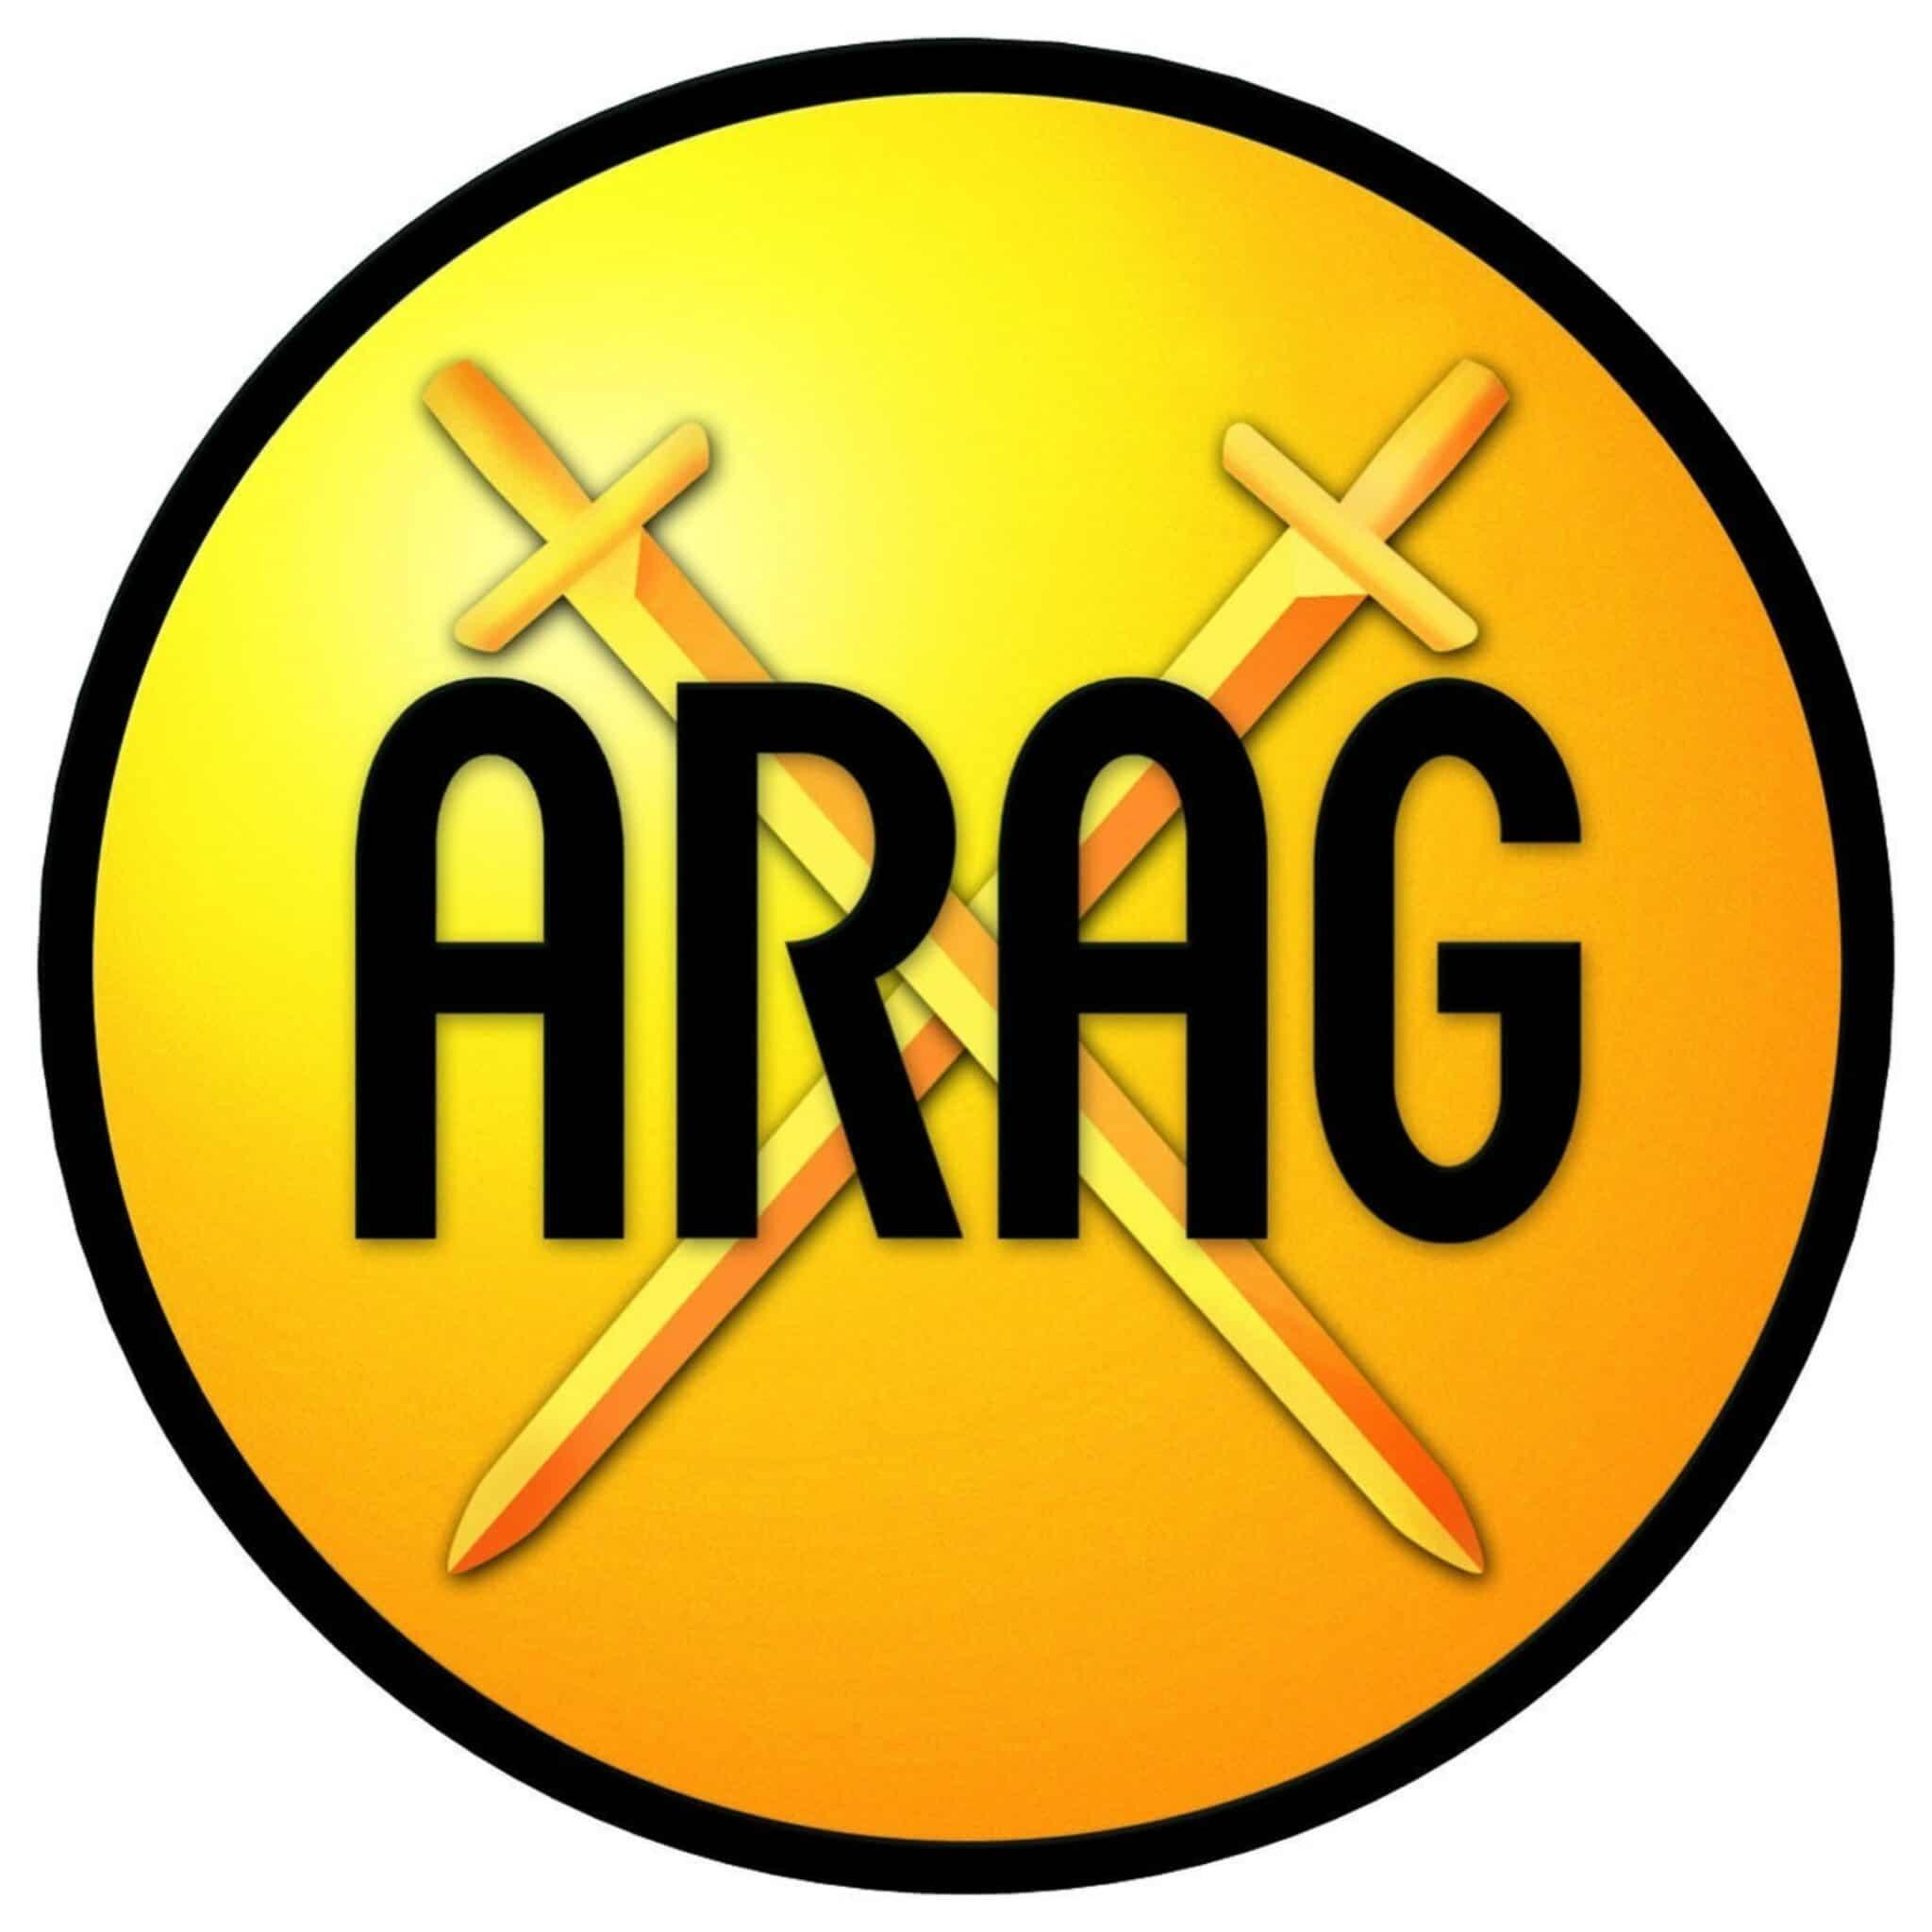 ARAG is a global provider of legal solutions. (PRNewsFoto/ARAG) (PRNewsFoto/ARAG)